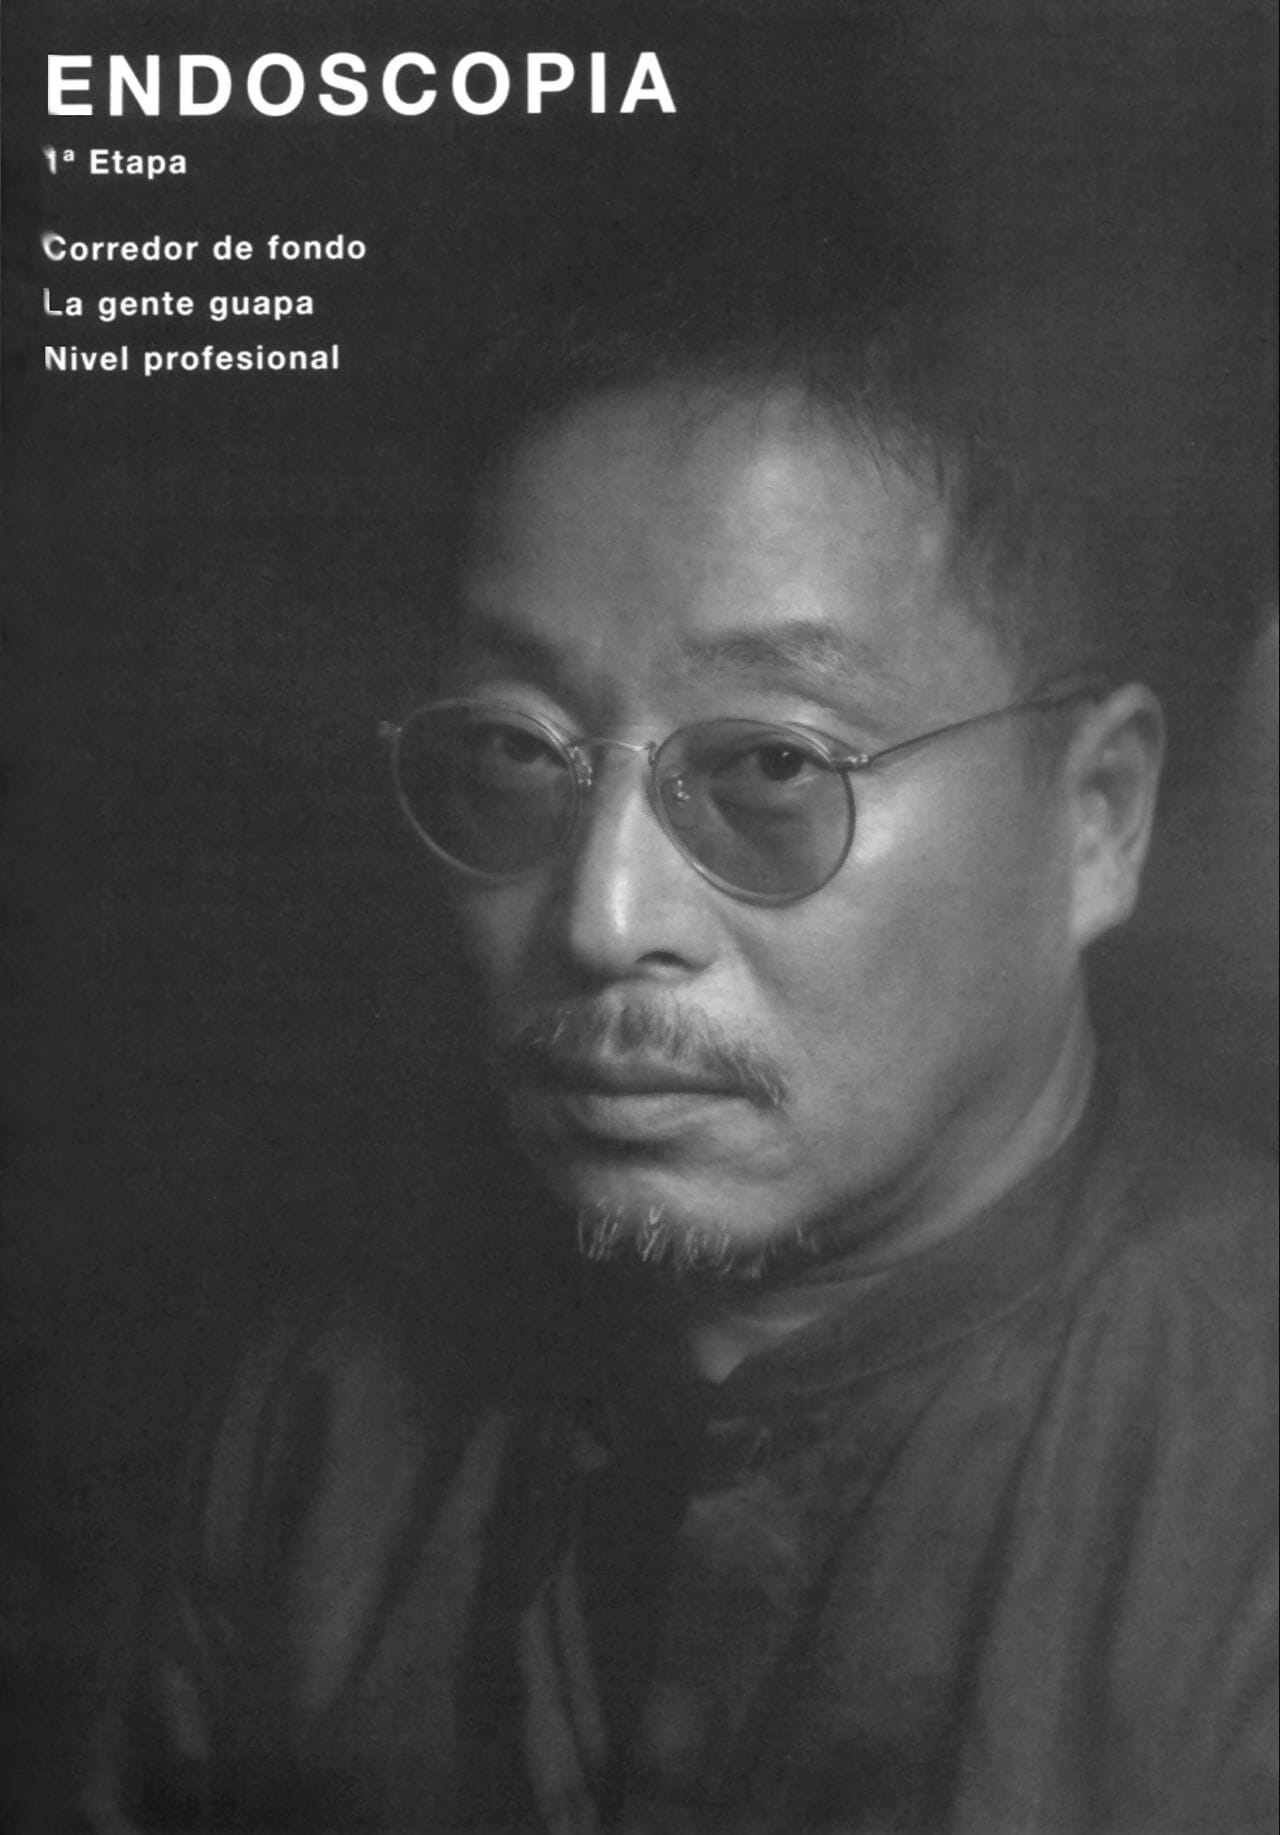 Causticness - Hajime Sorayama - faithfulness 3